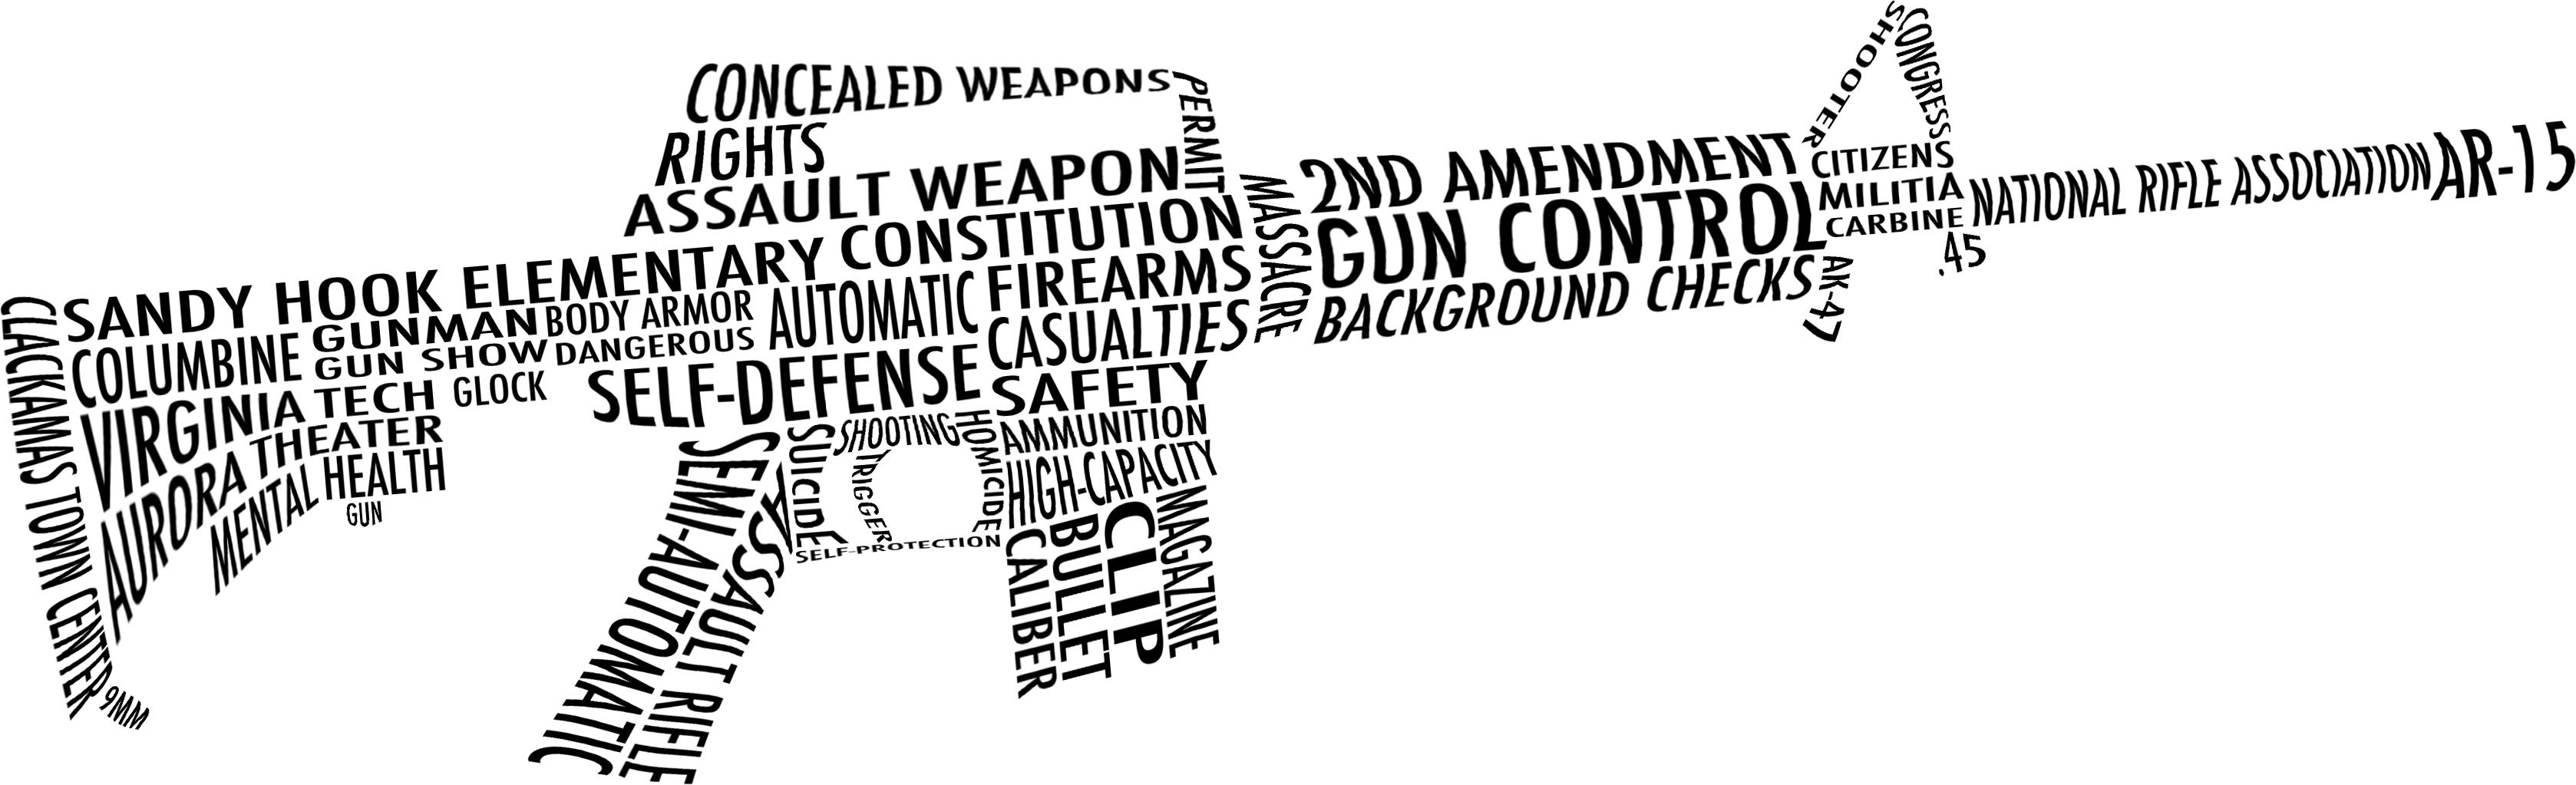 gun-control-graphic2backup